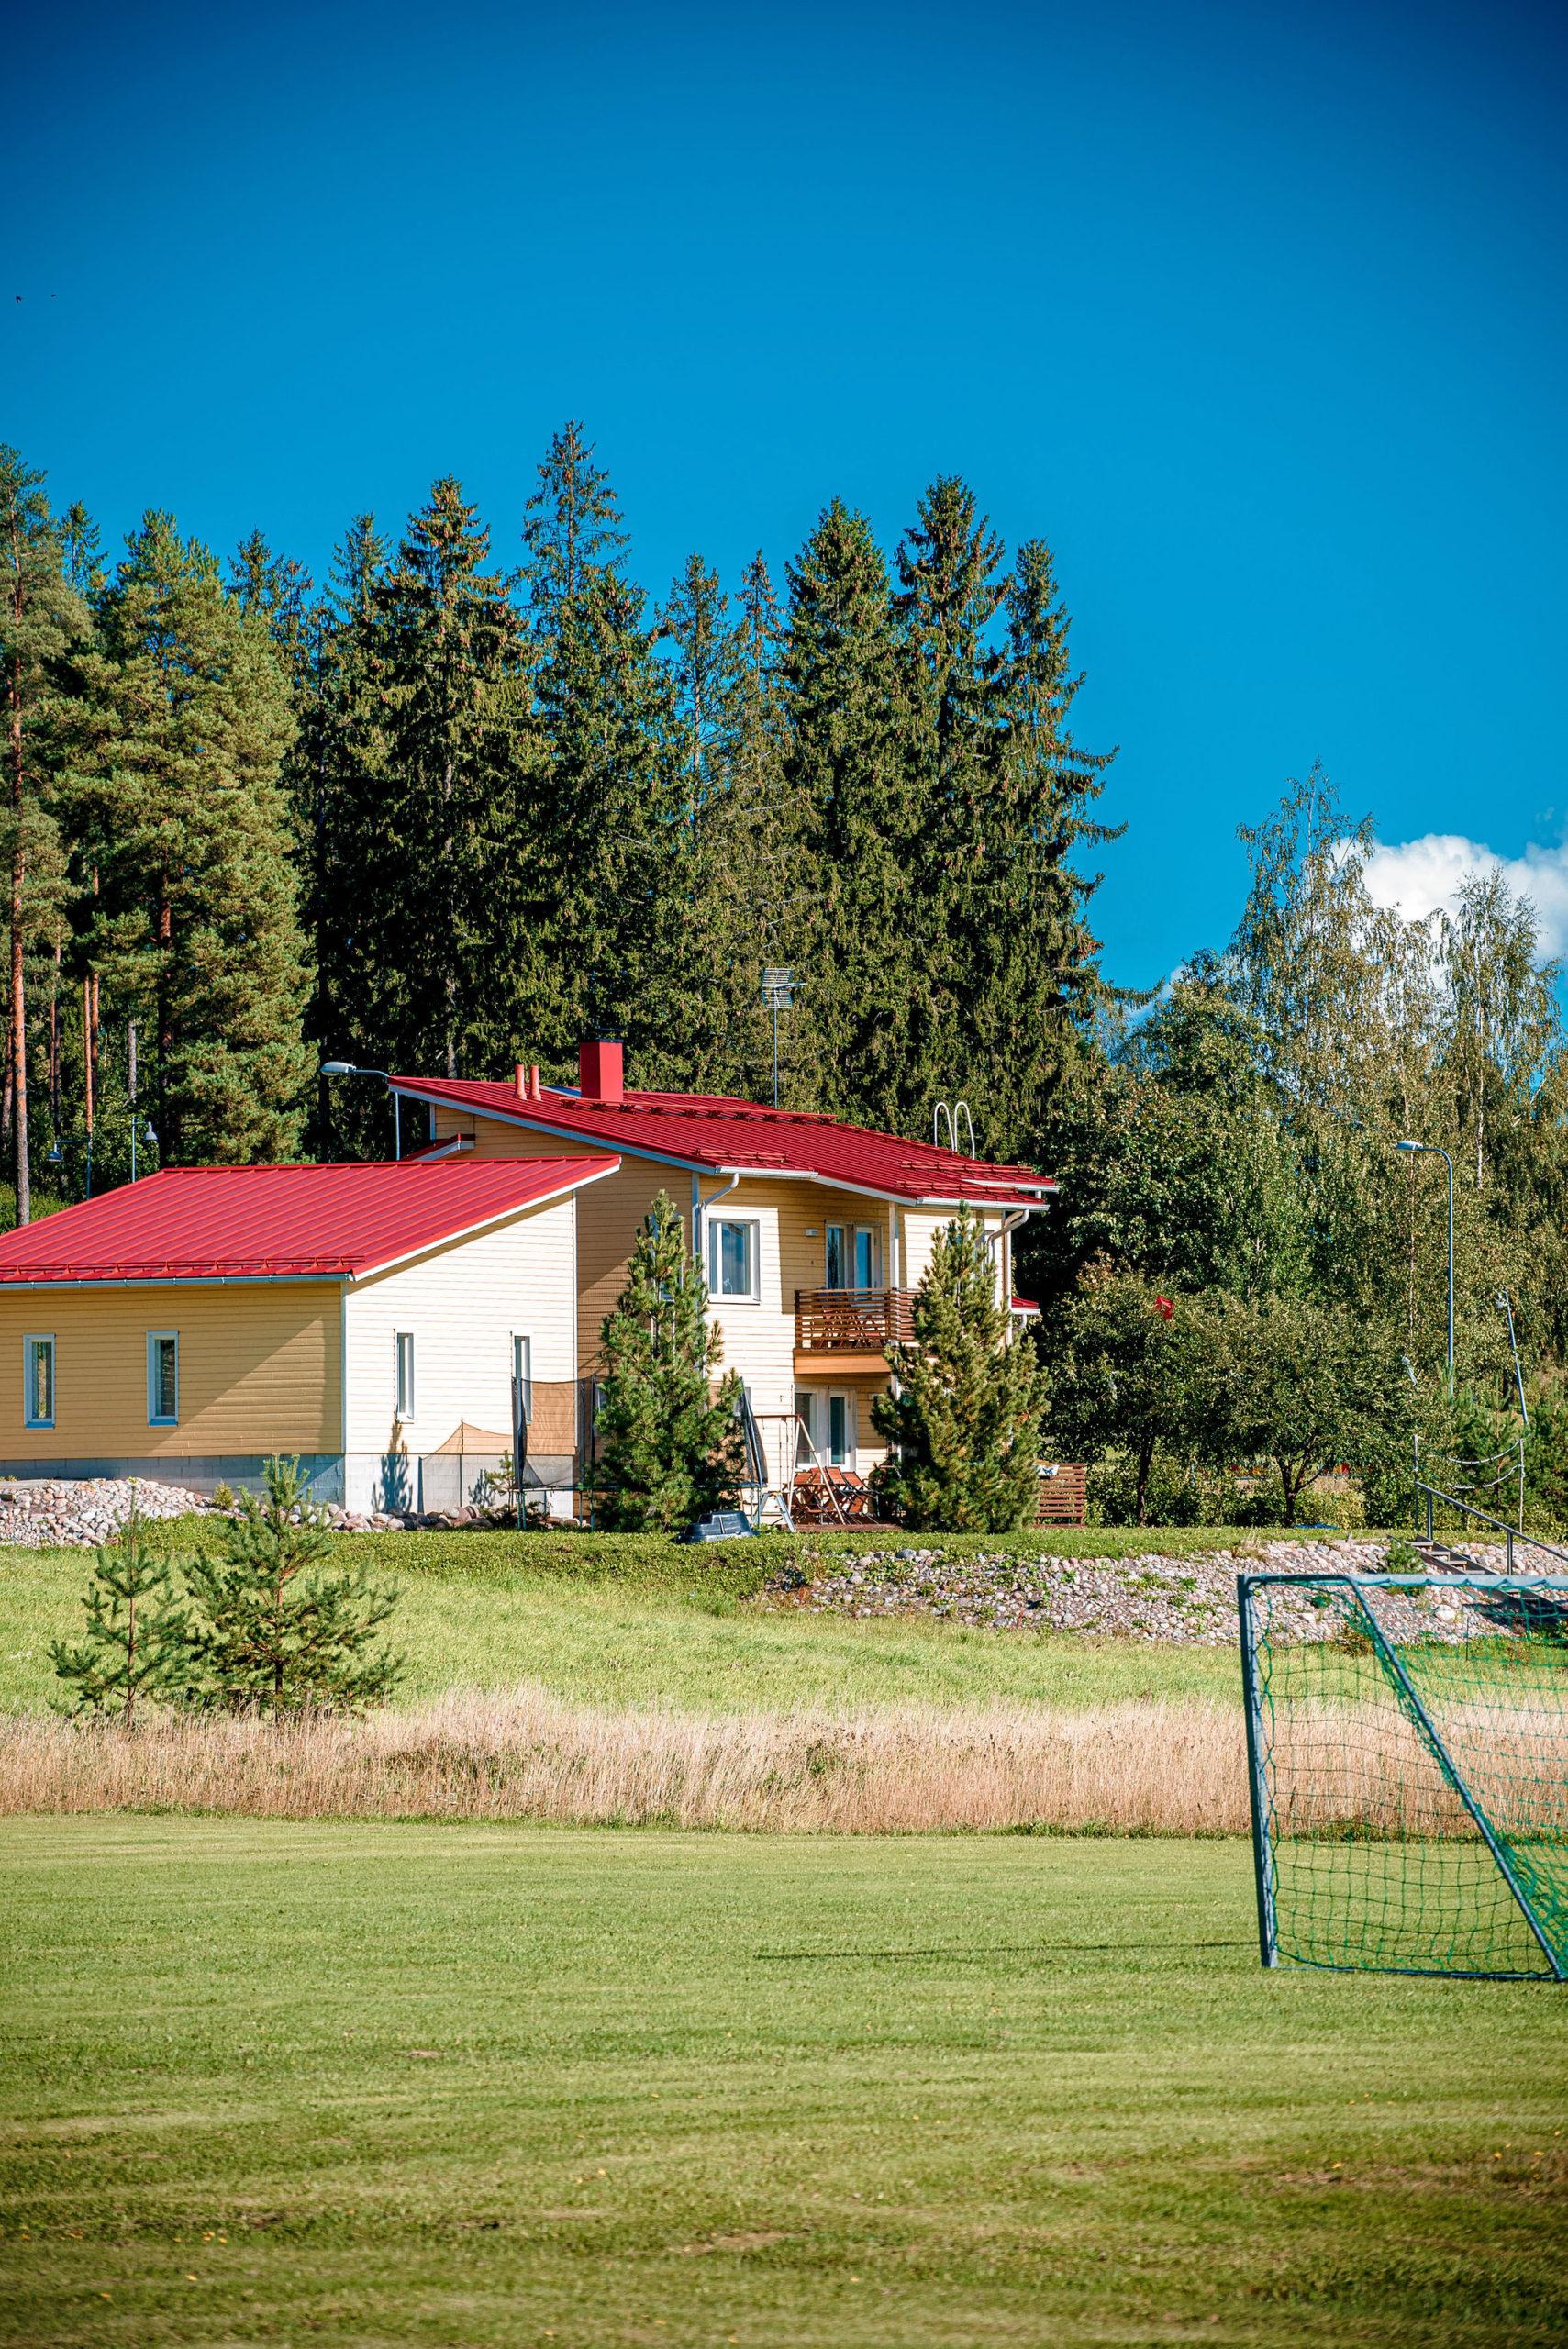 Talo punaisella katolla